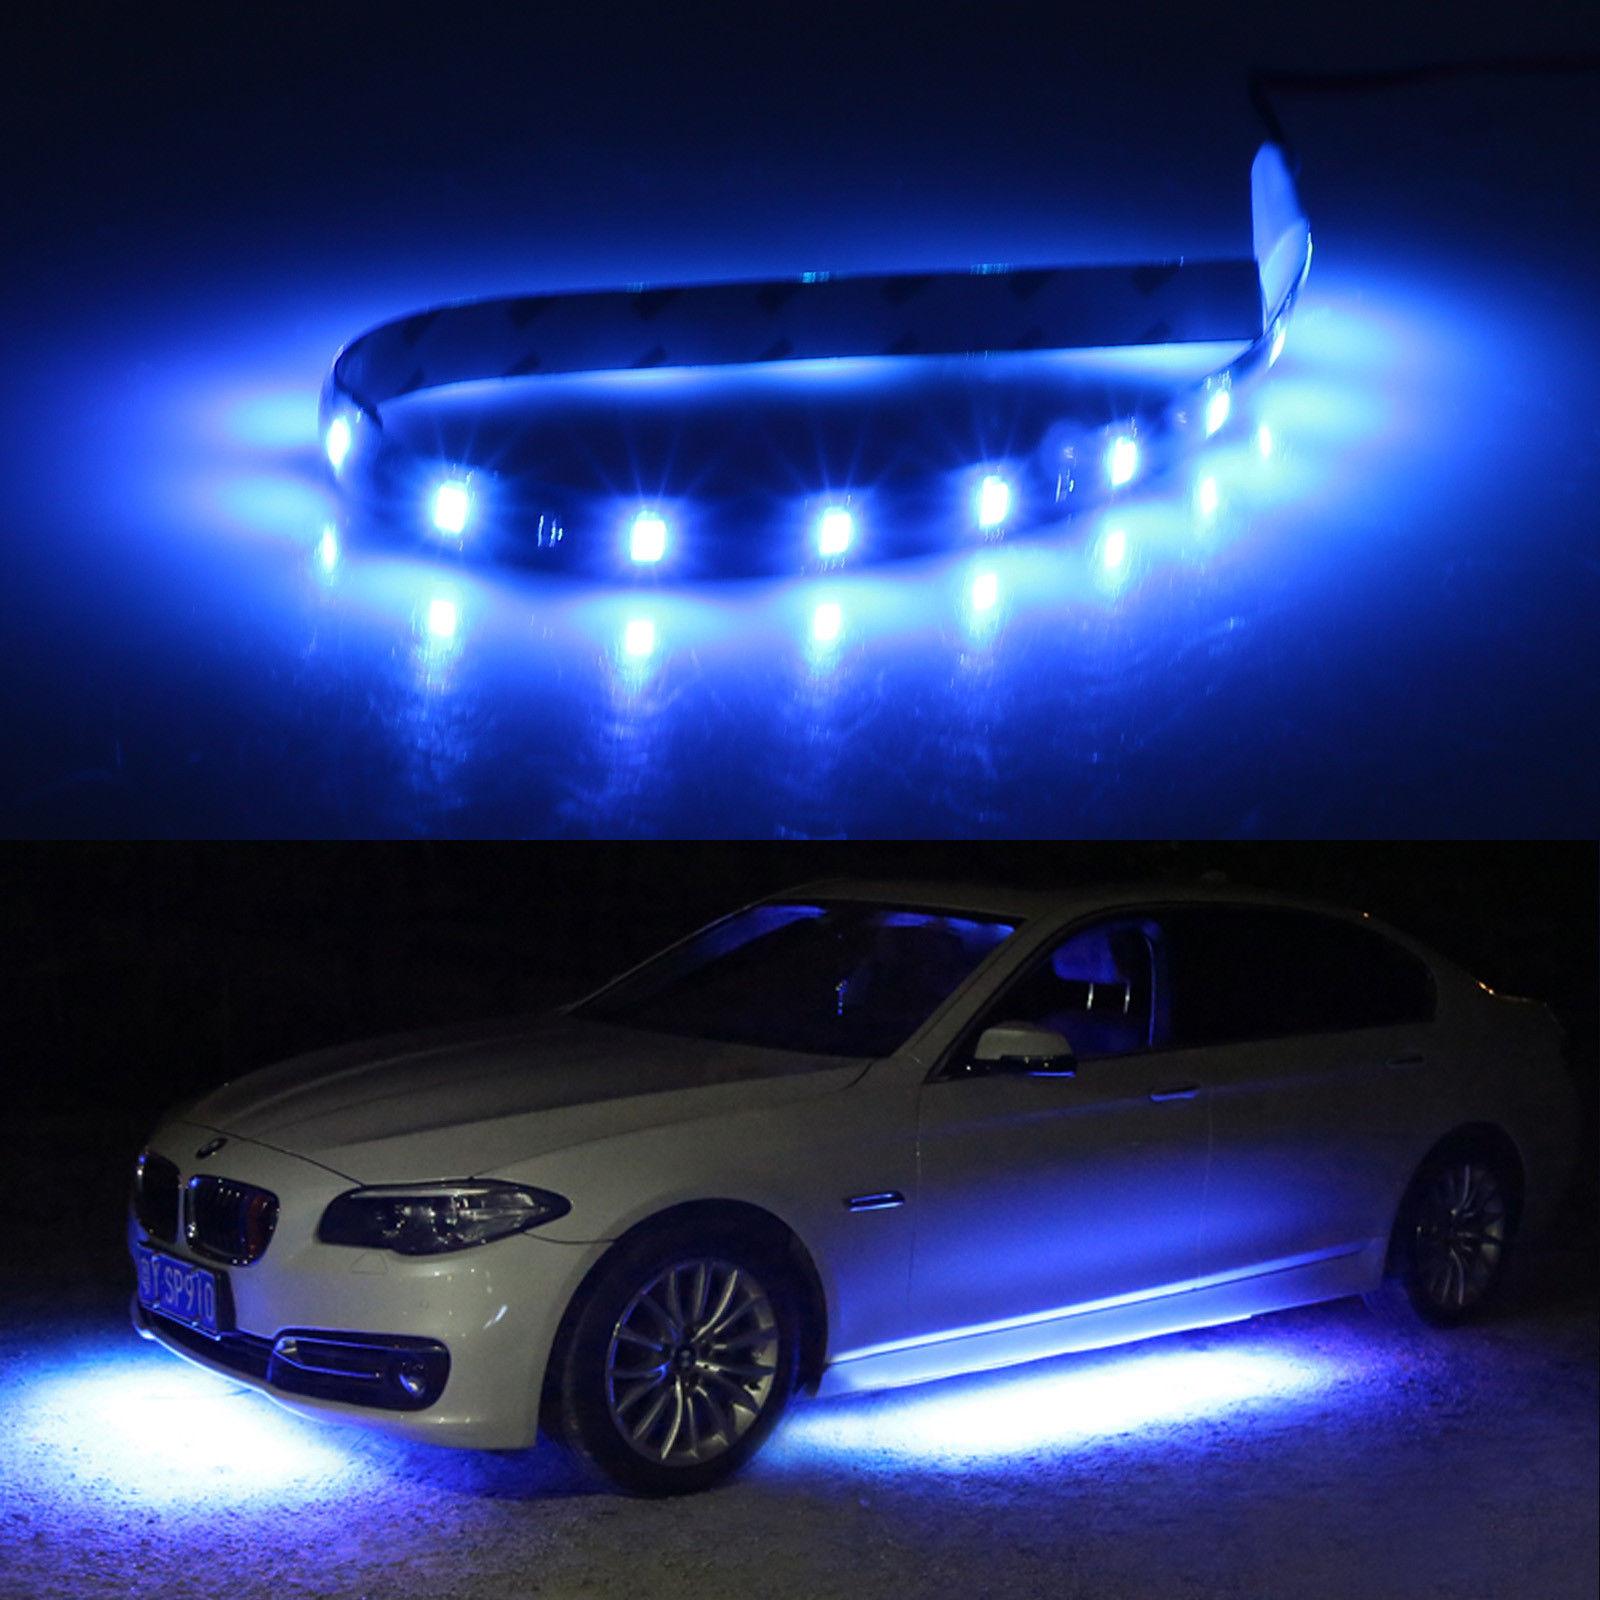 6pcs Waterproof Flexible 12 15 Led Strip Underbody Light For Car